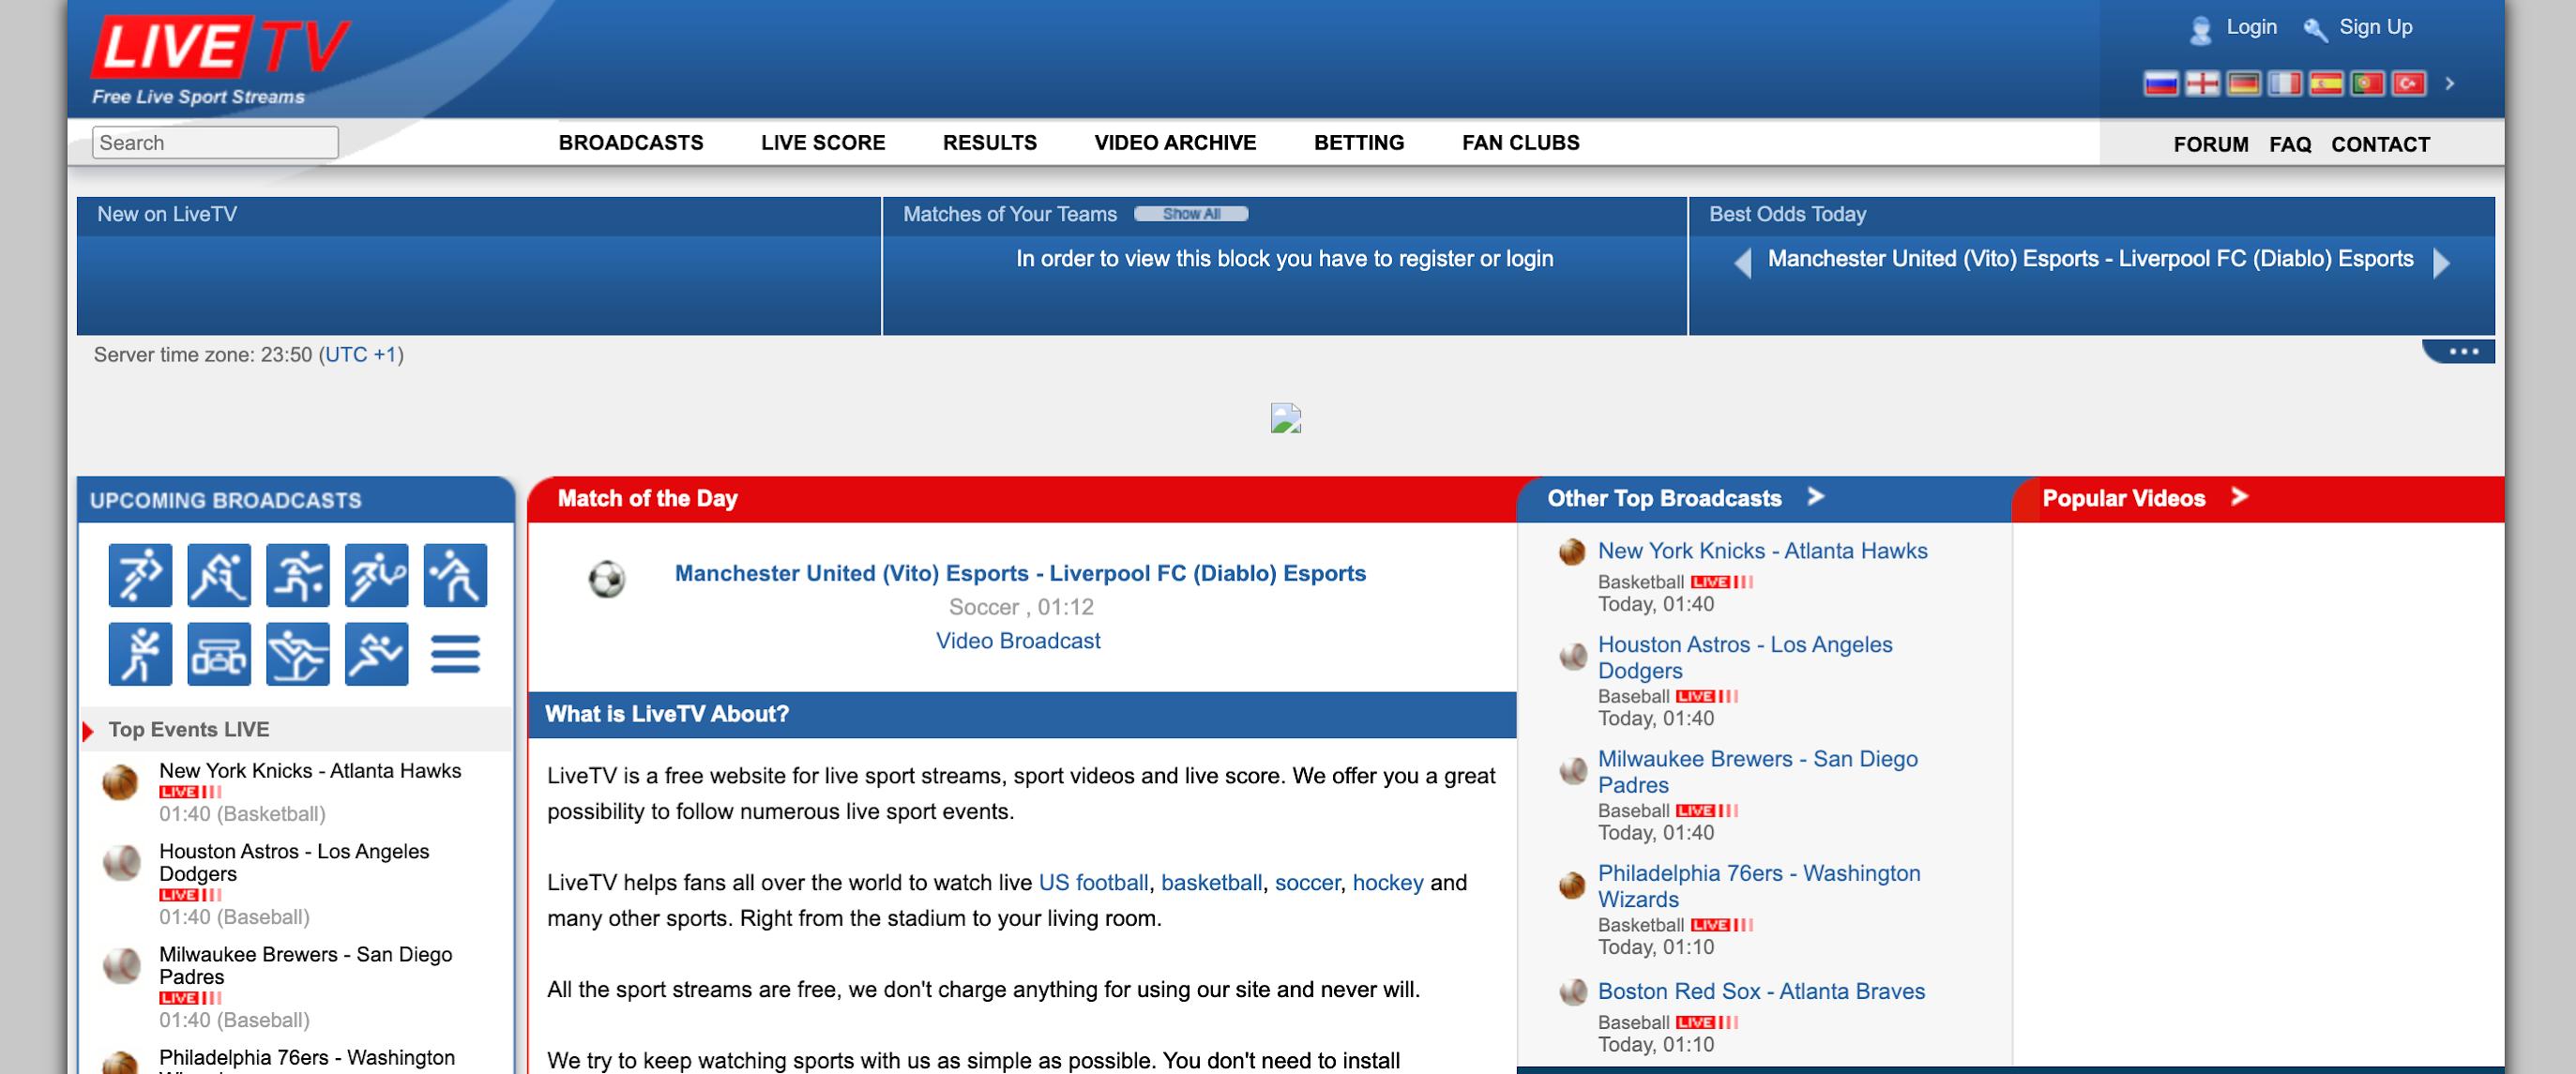 LiveTV sports streaming sites free